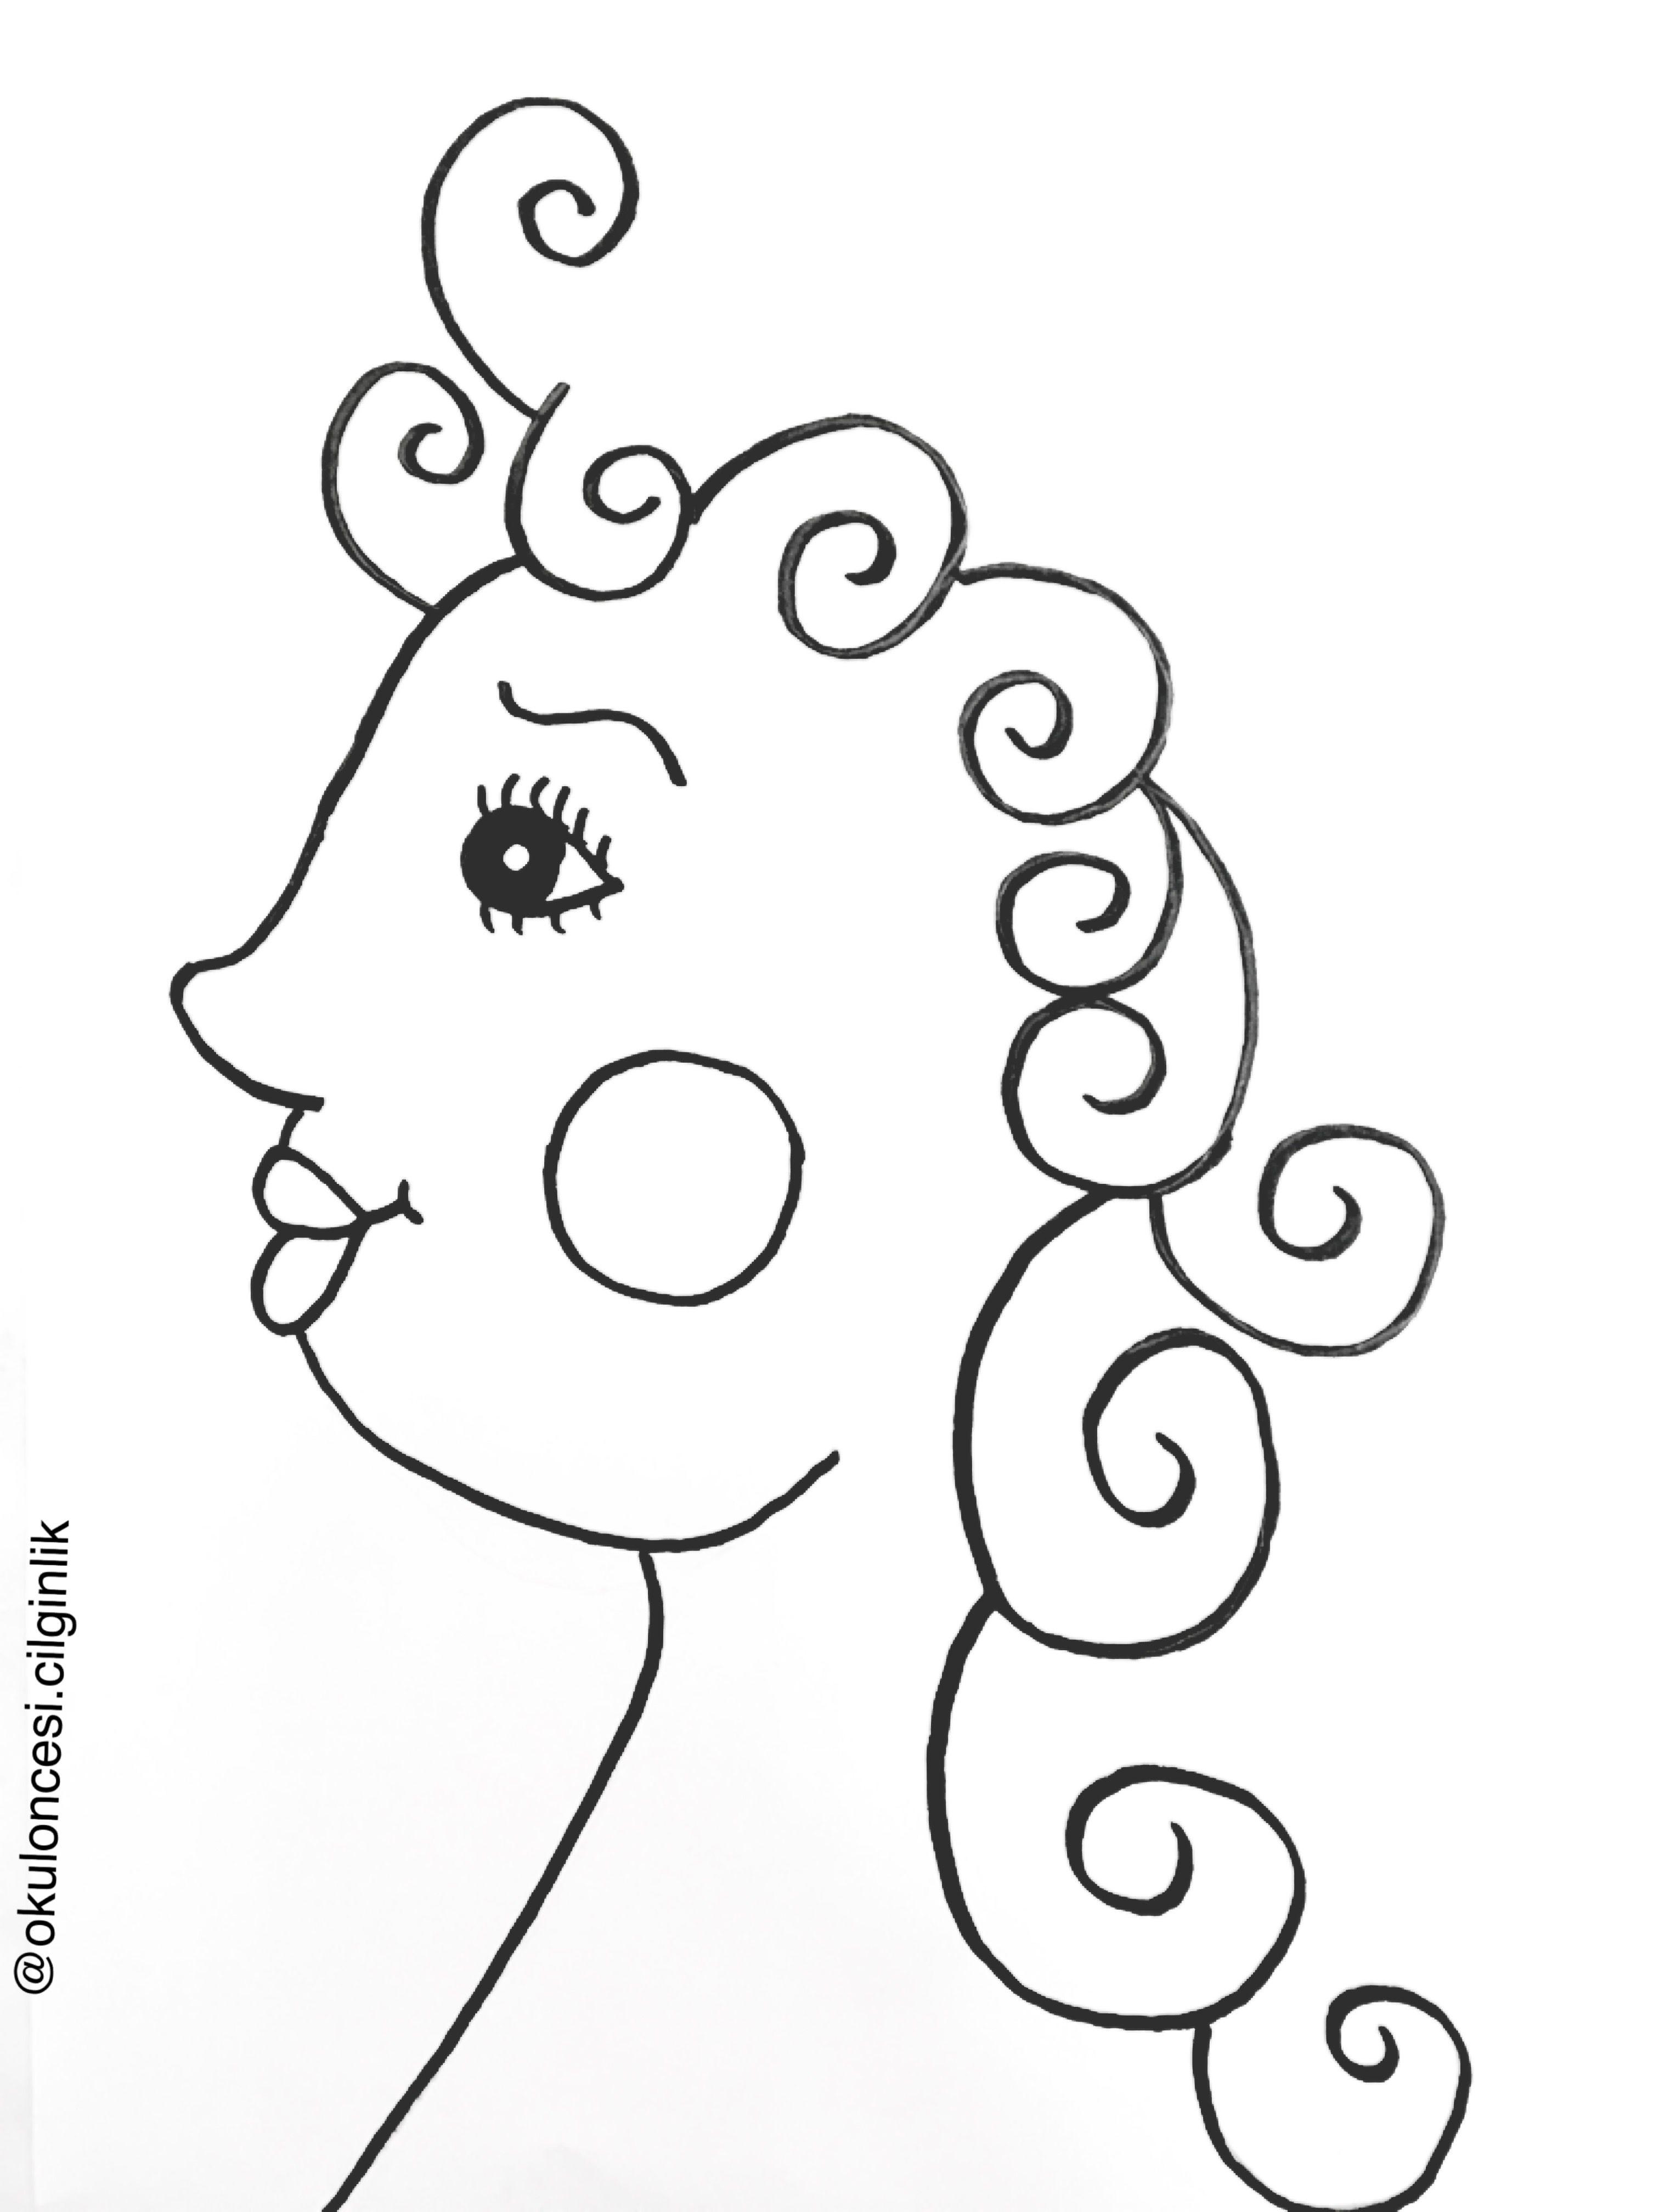 Pin de Esra en İlk günler etkinlik | Pinterest